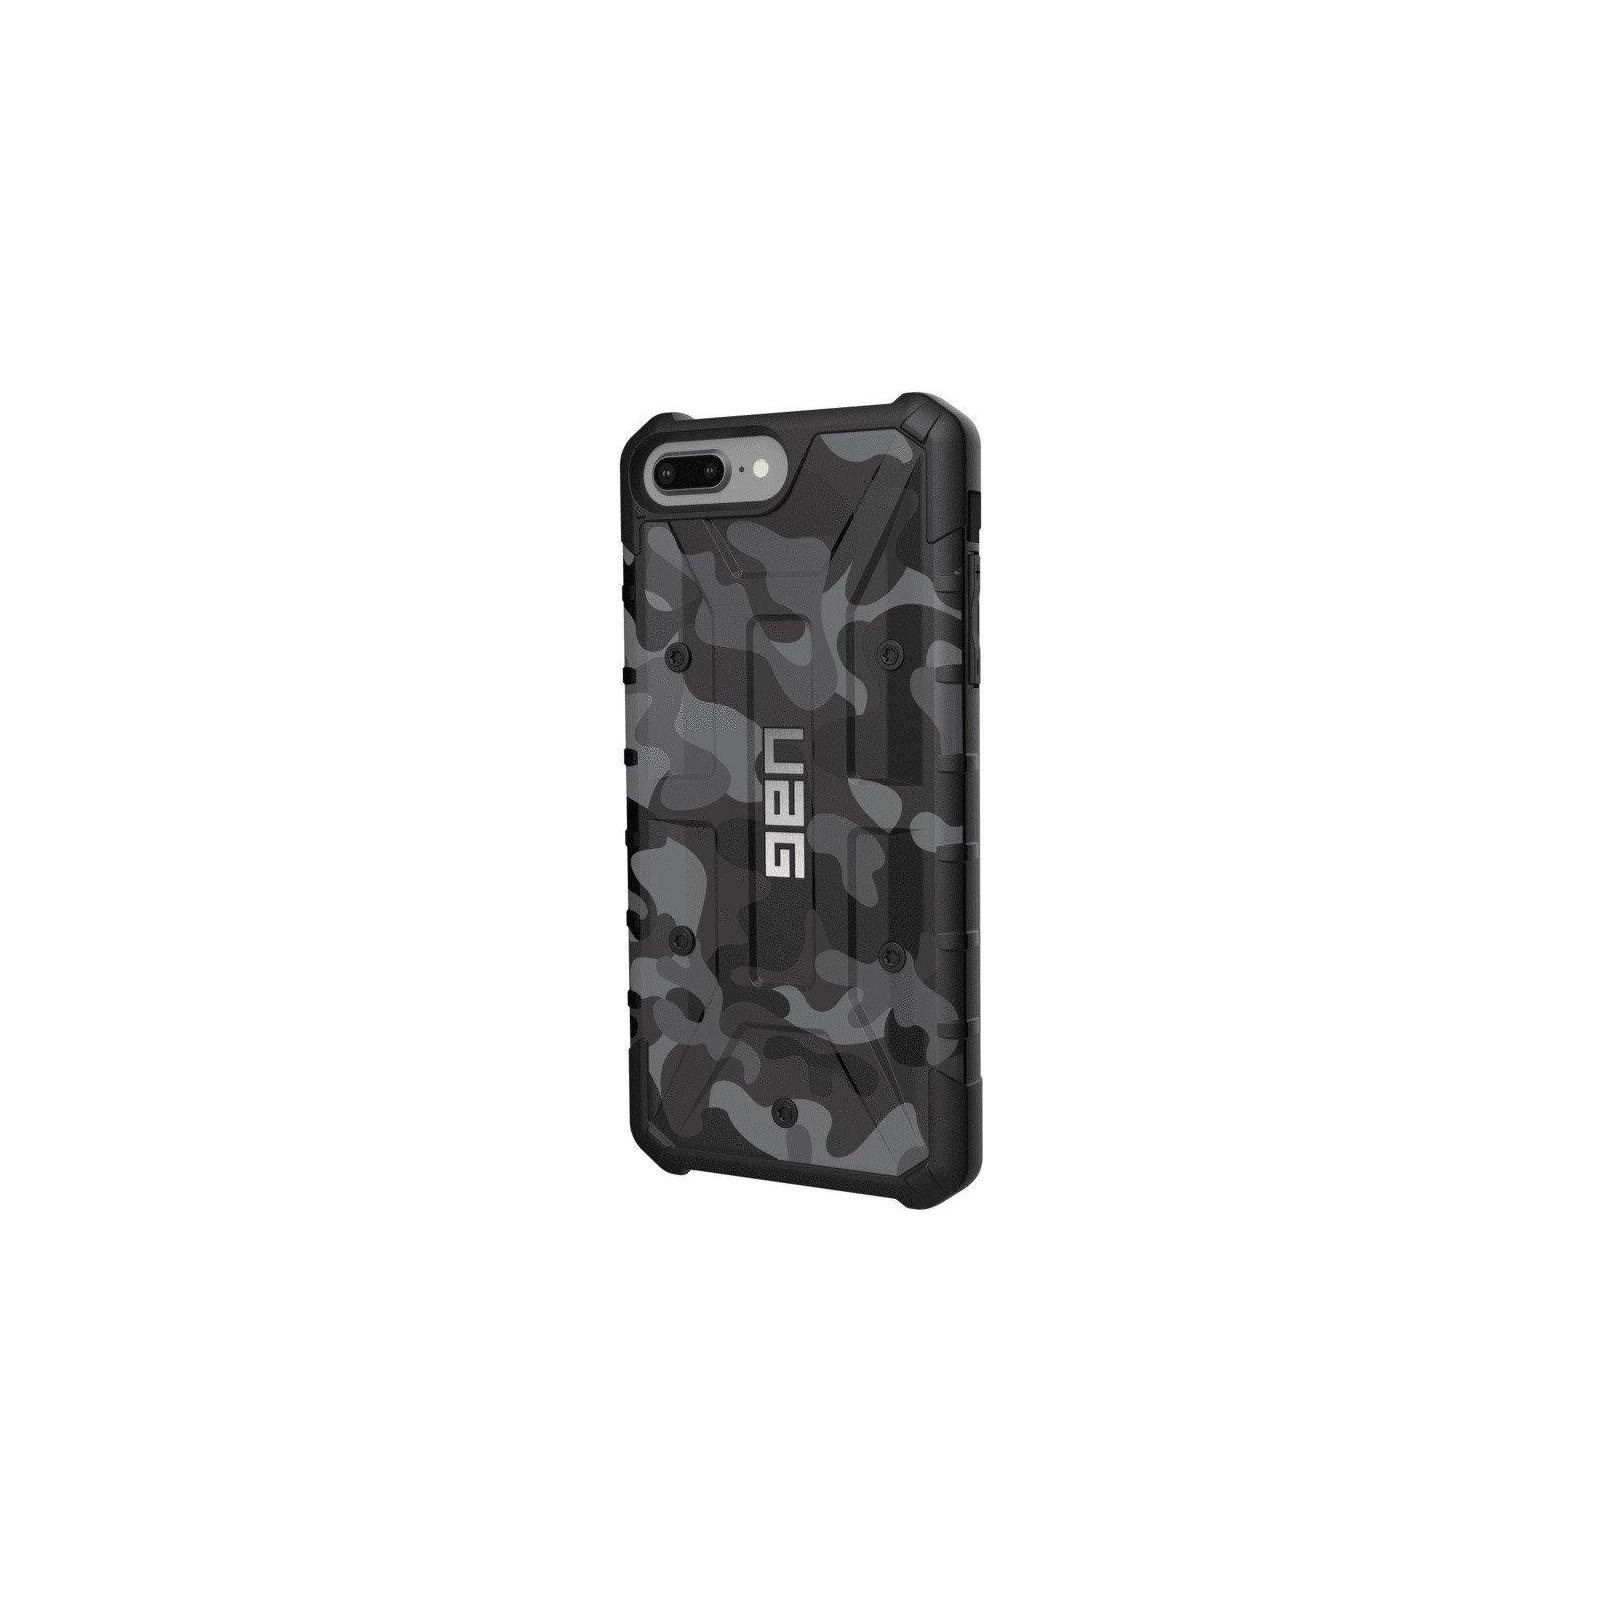 Чехол для моб. телефона Urban Armor Gear iPhone 8/7/6S Plus Pathfinder Camo Gray/Black (IPH8/7PLS-A-BC) изображение 3